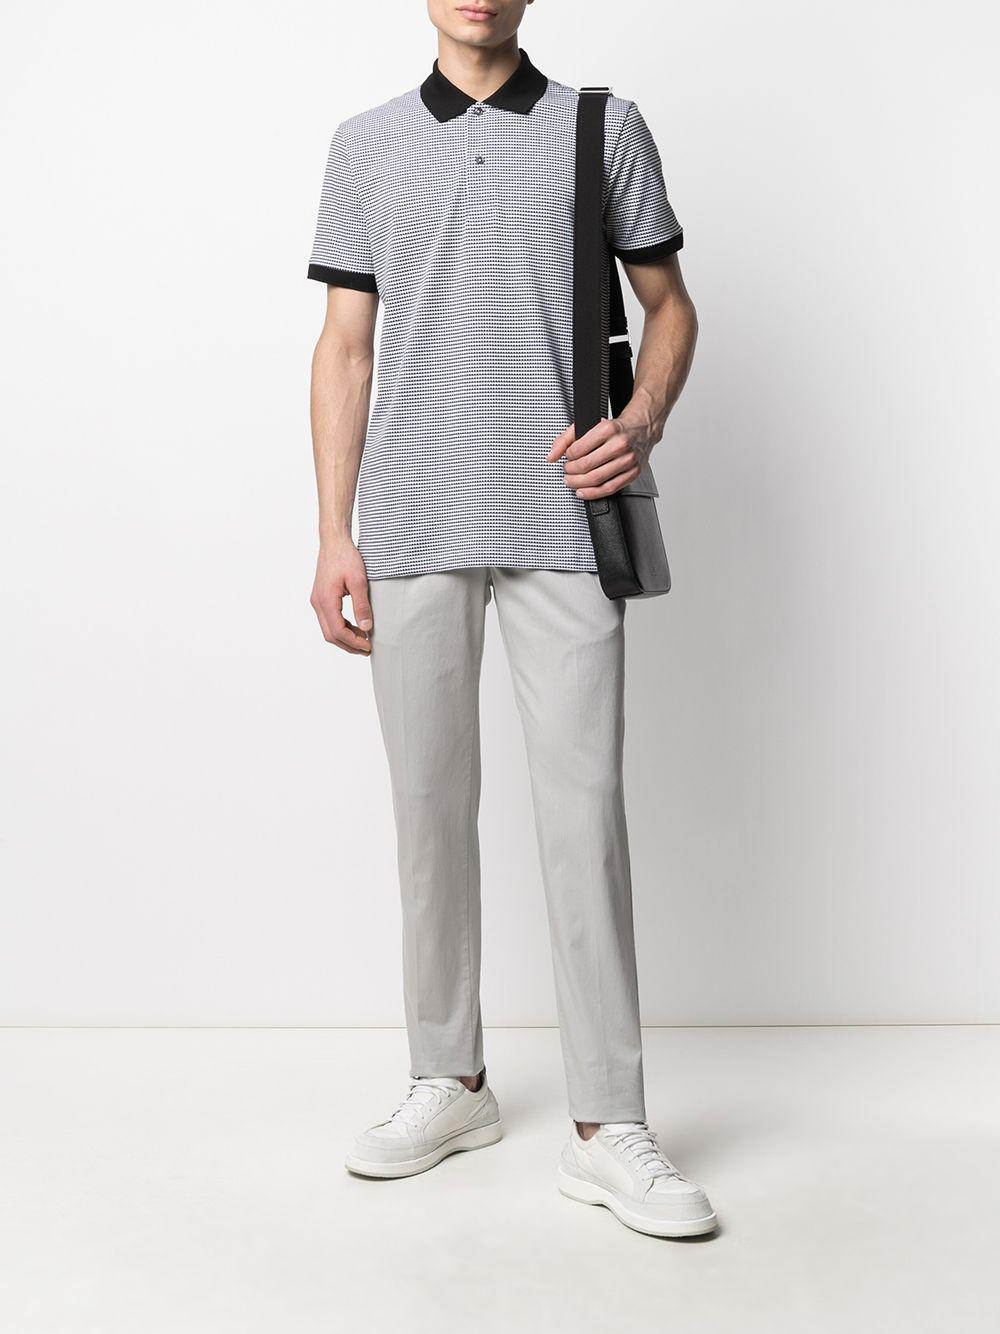 Grey cotton blend straight leg chinos  PT01 |  | COWTJ1ZA0TVL-NU050020